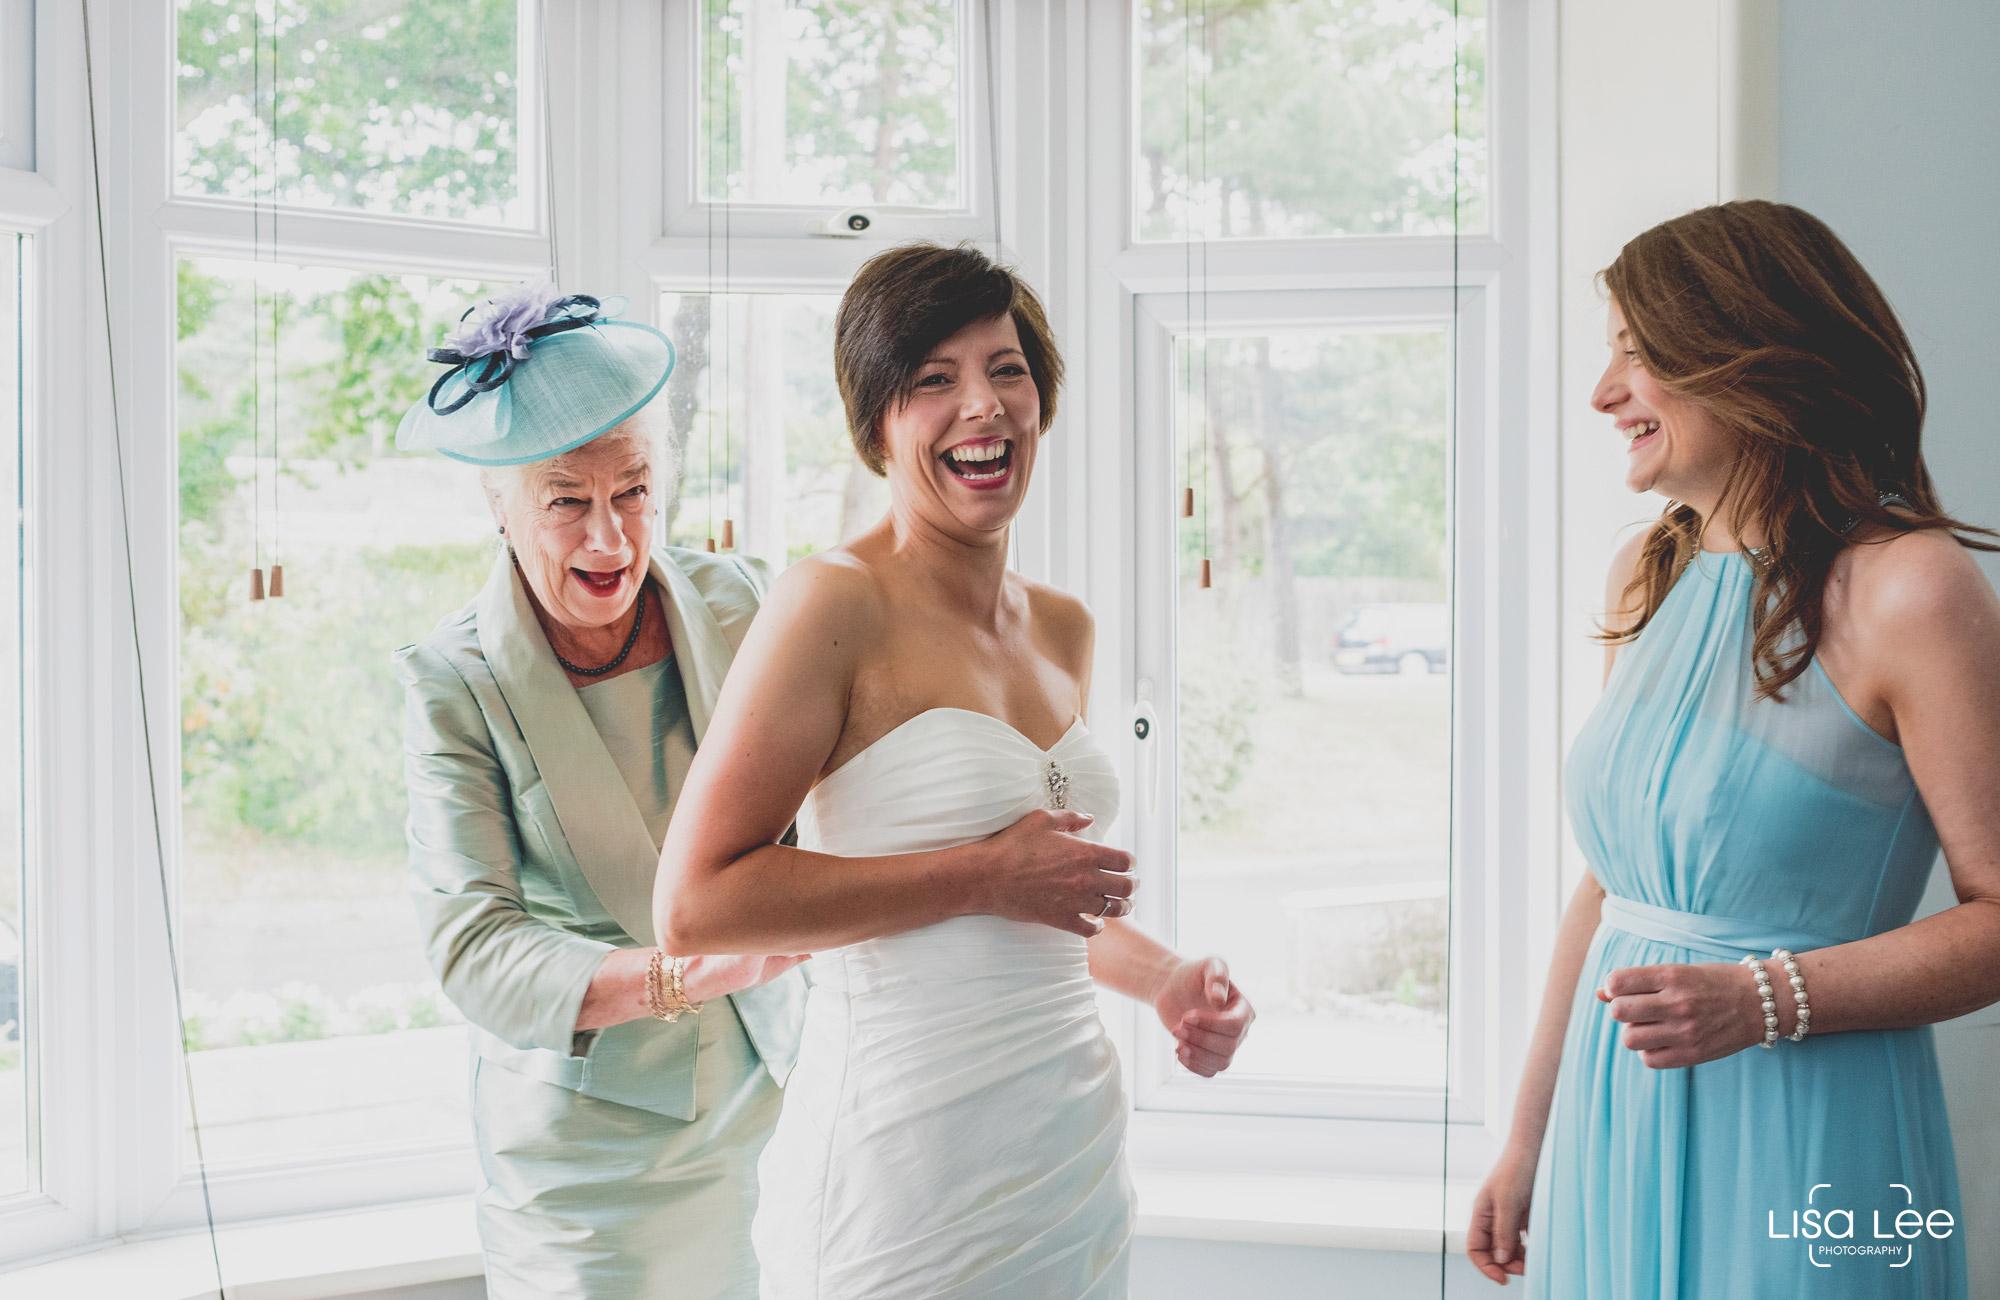 lisa-lee-wedding-photography-burton-gettingready.jpg